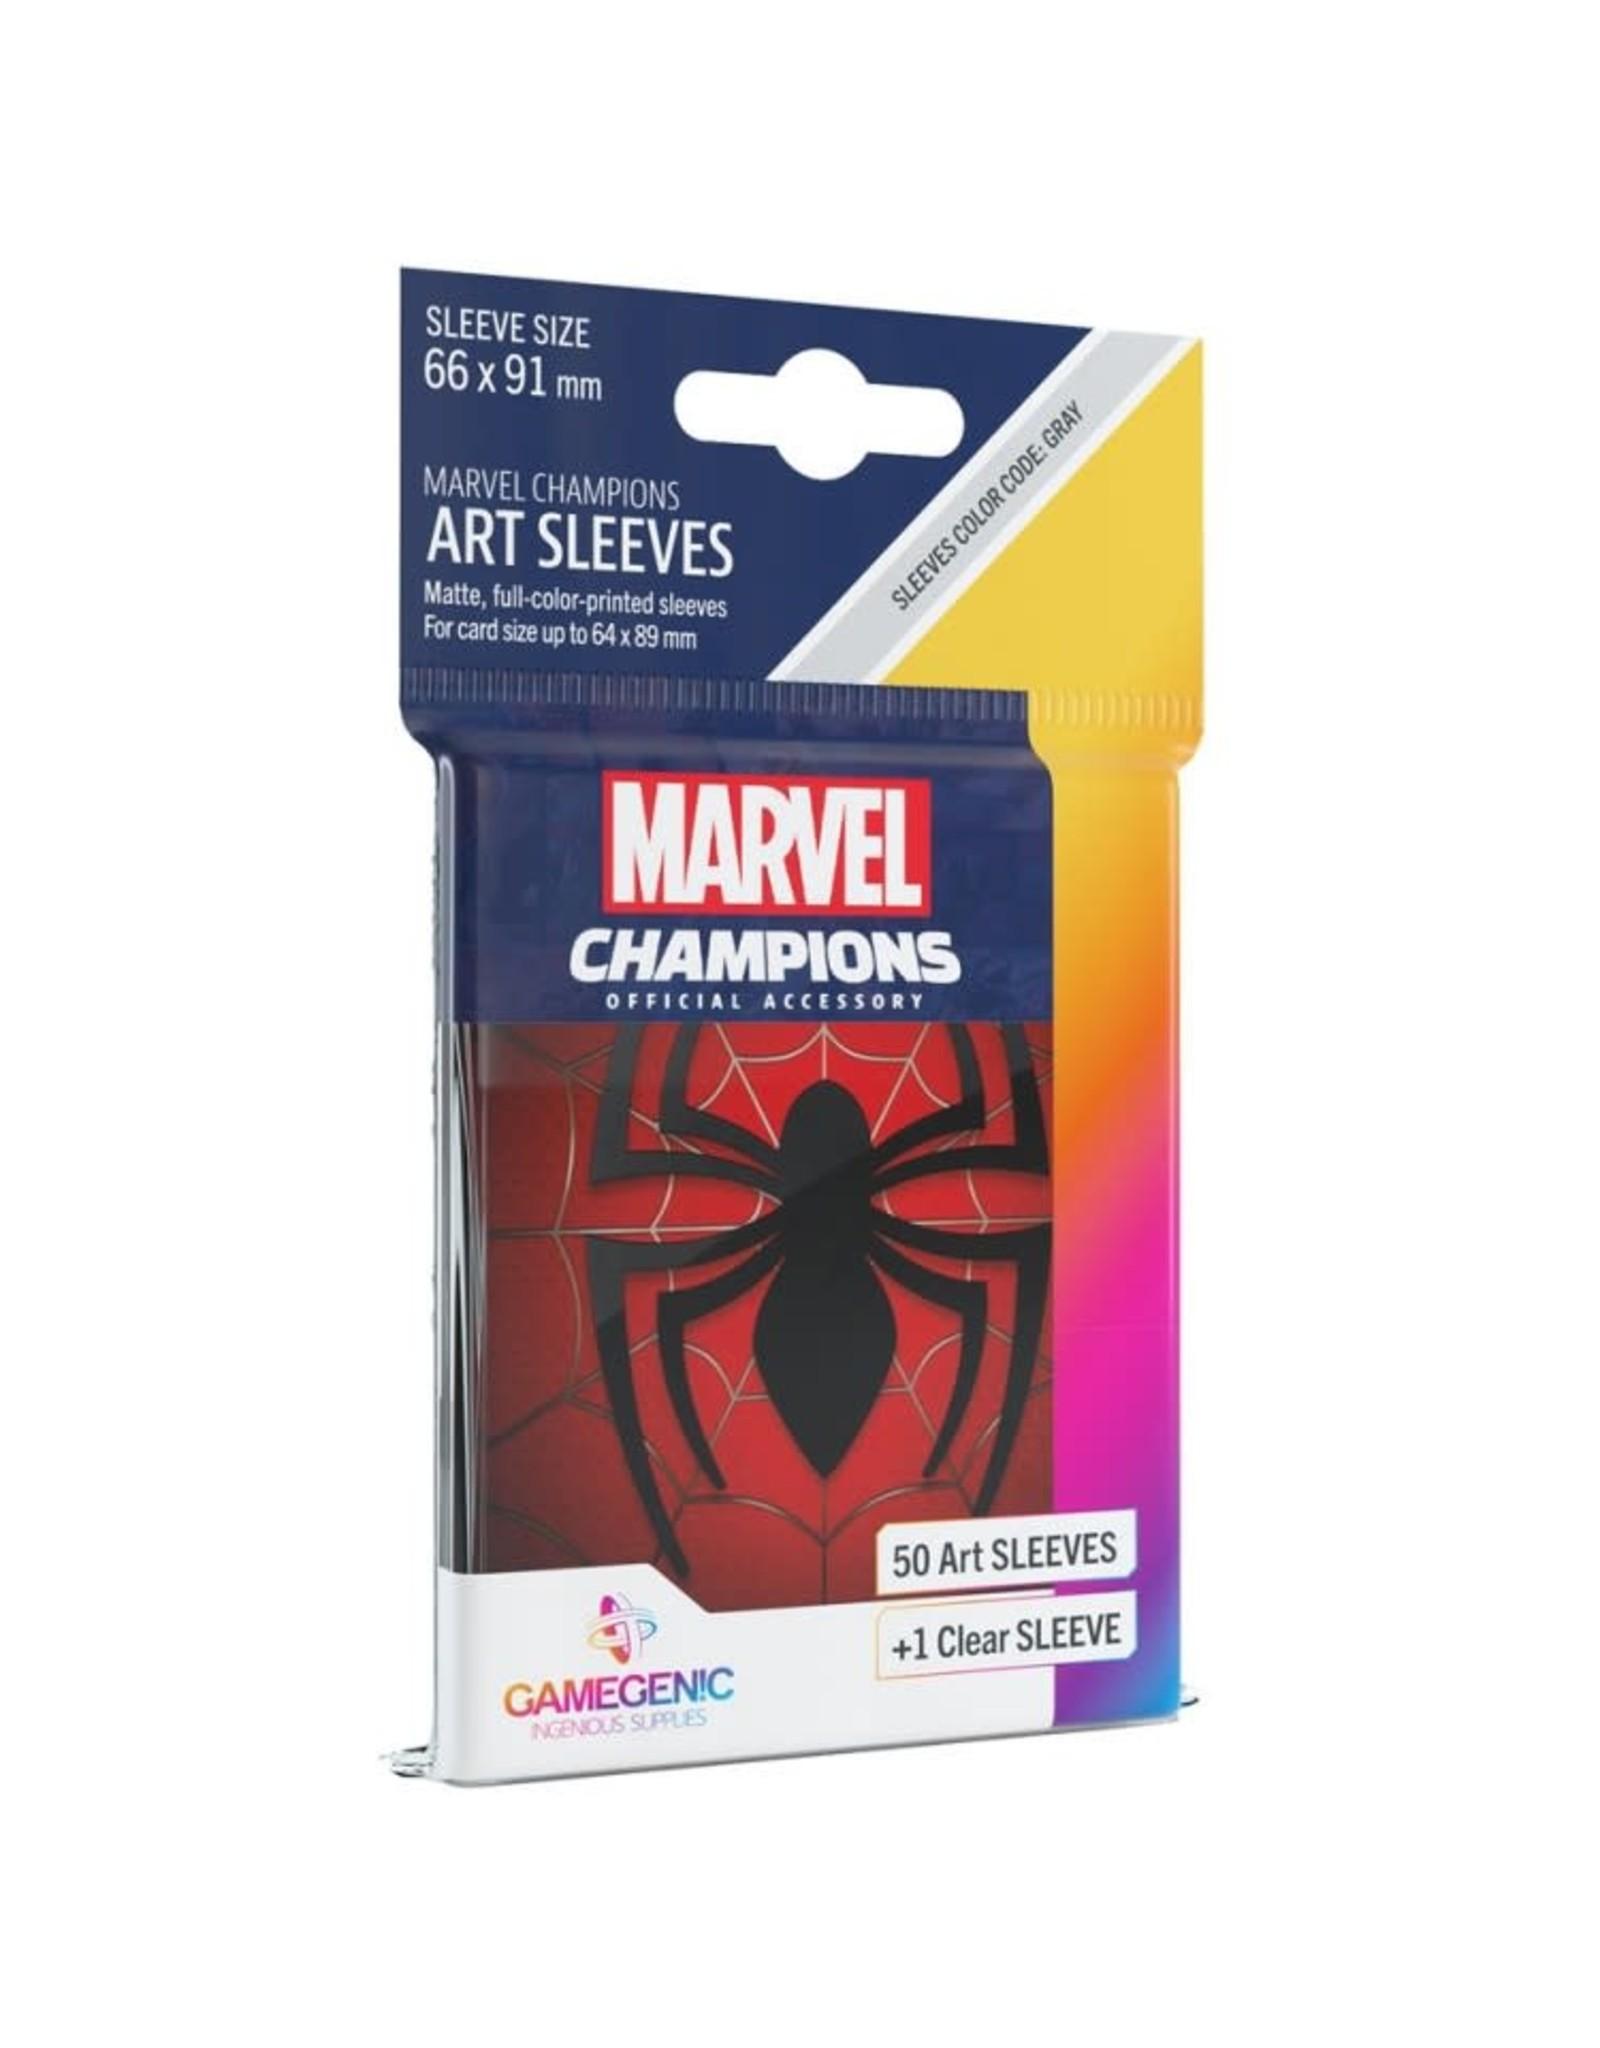 GameGenic Marvel Champions LCG: Spider-Man Sleeves